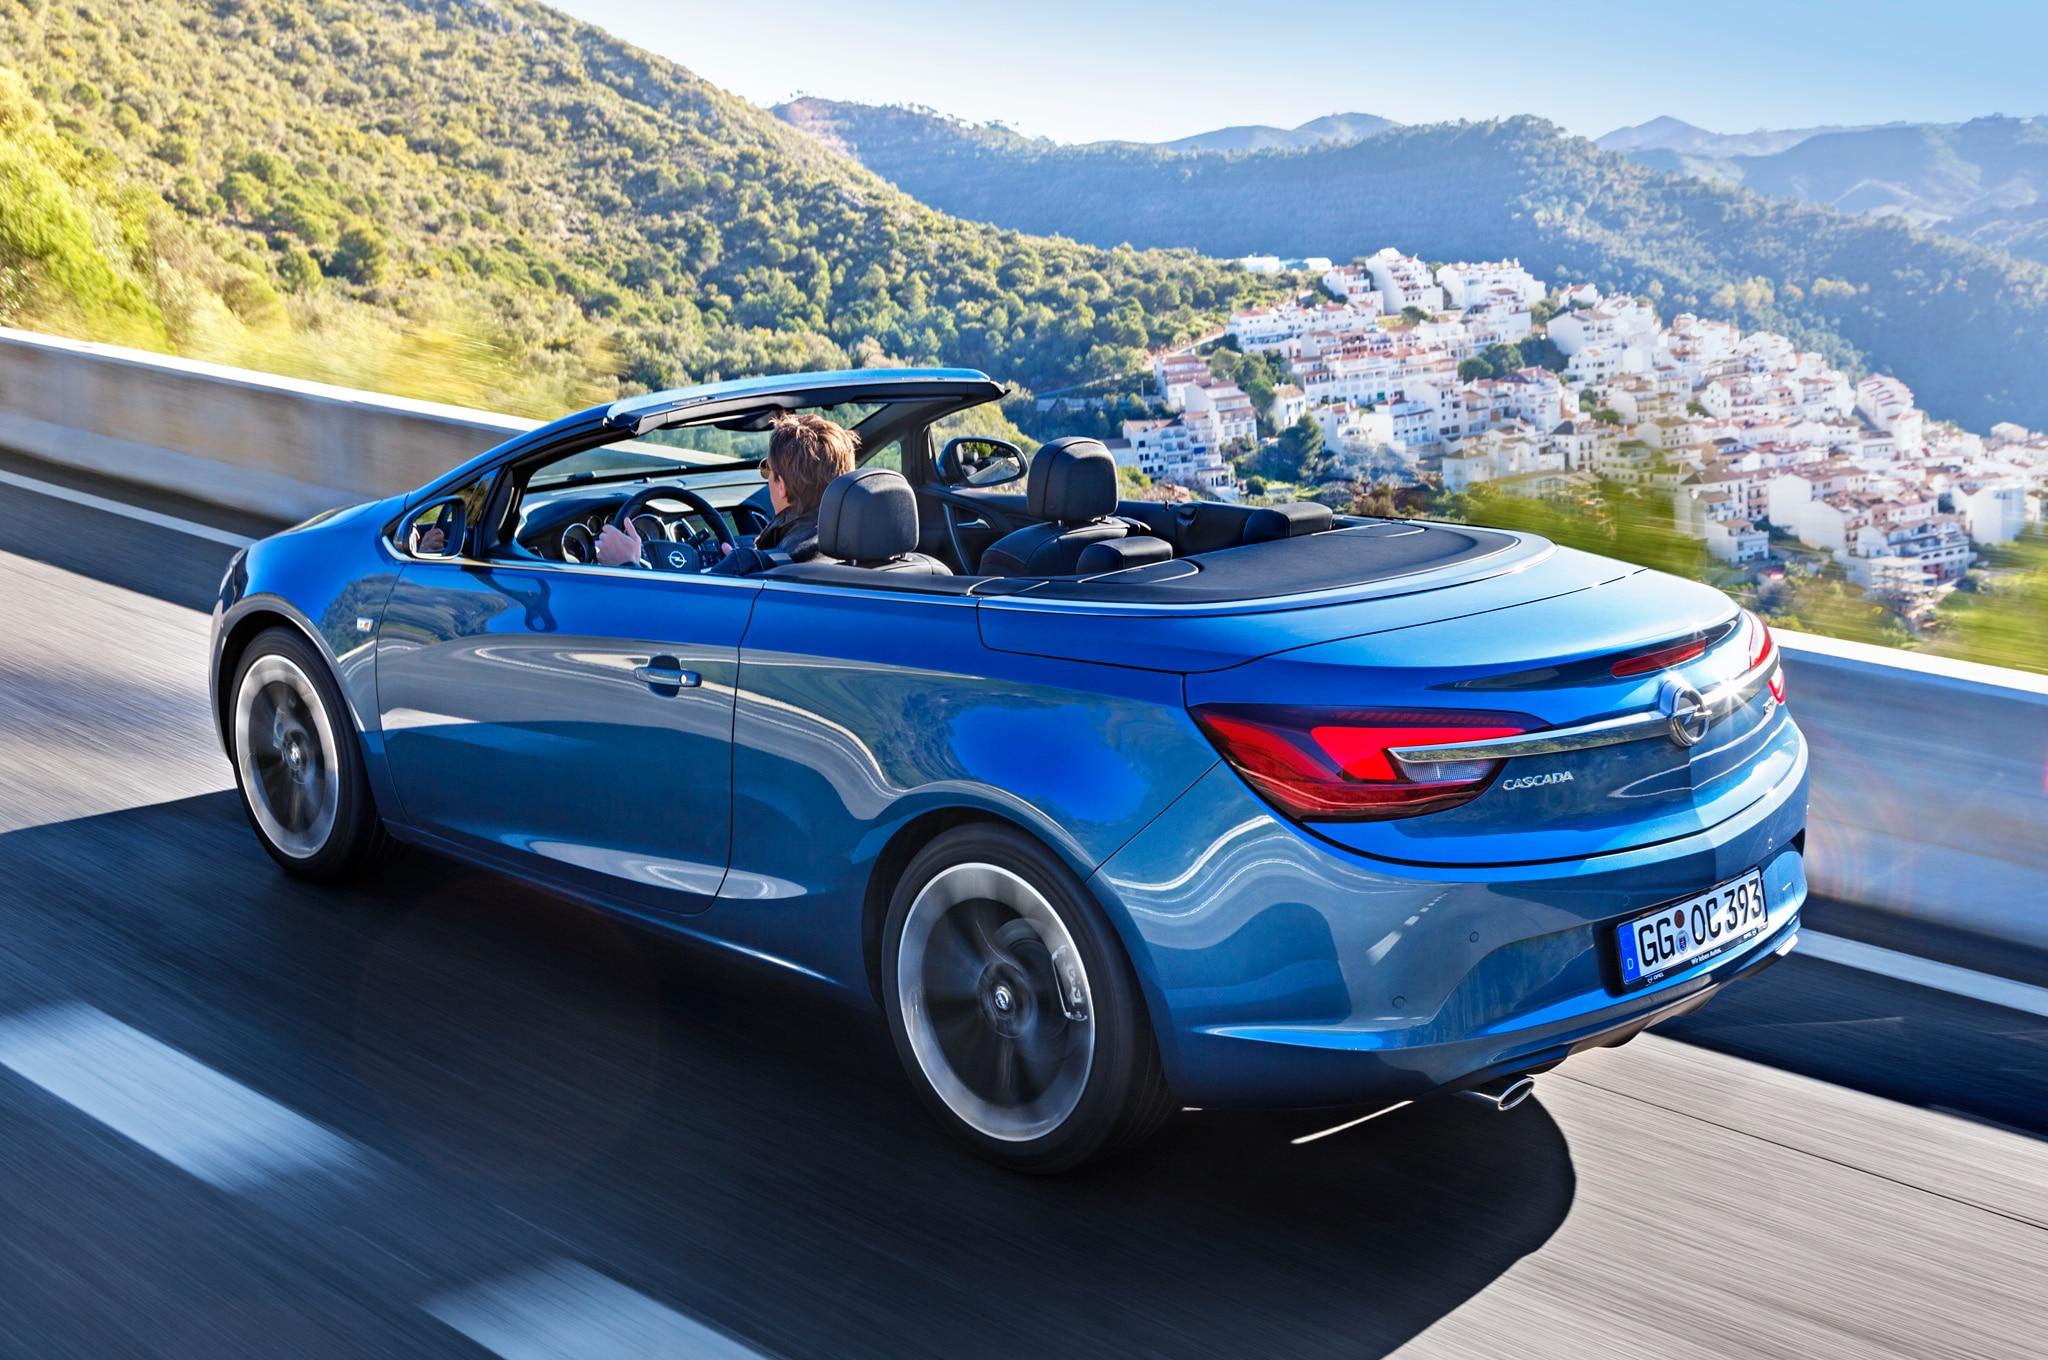 Opel Cascada Left Rear Angle